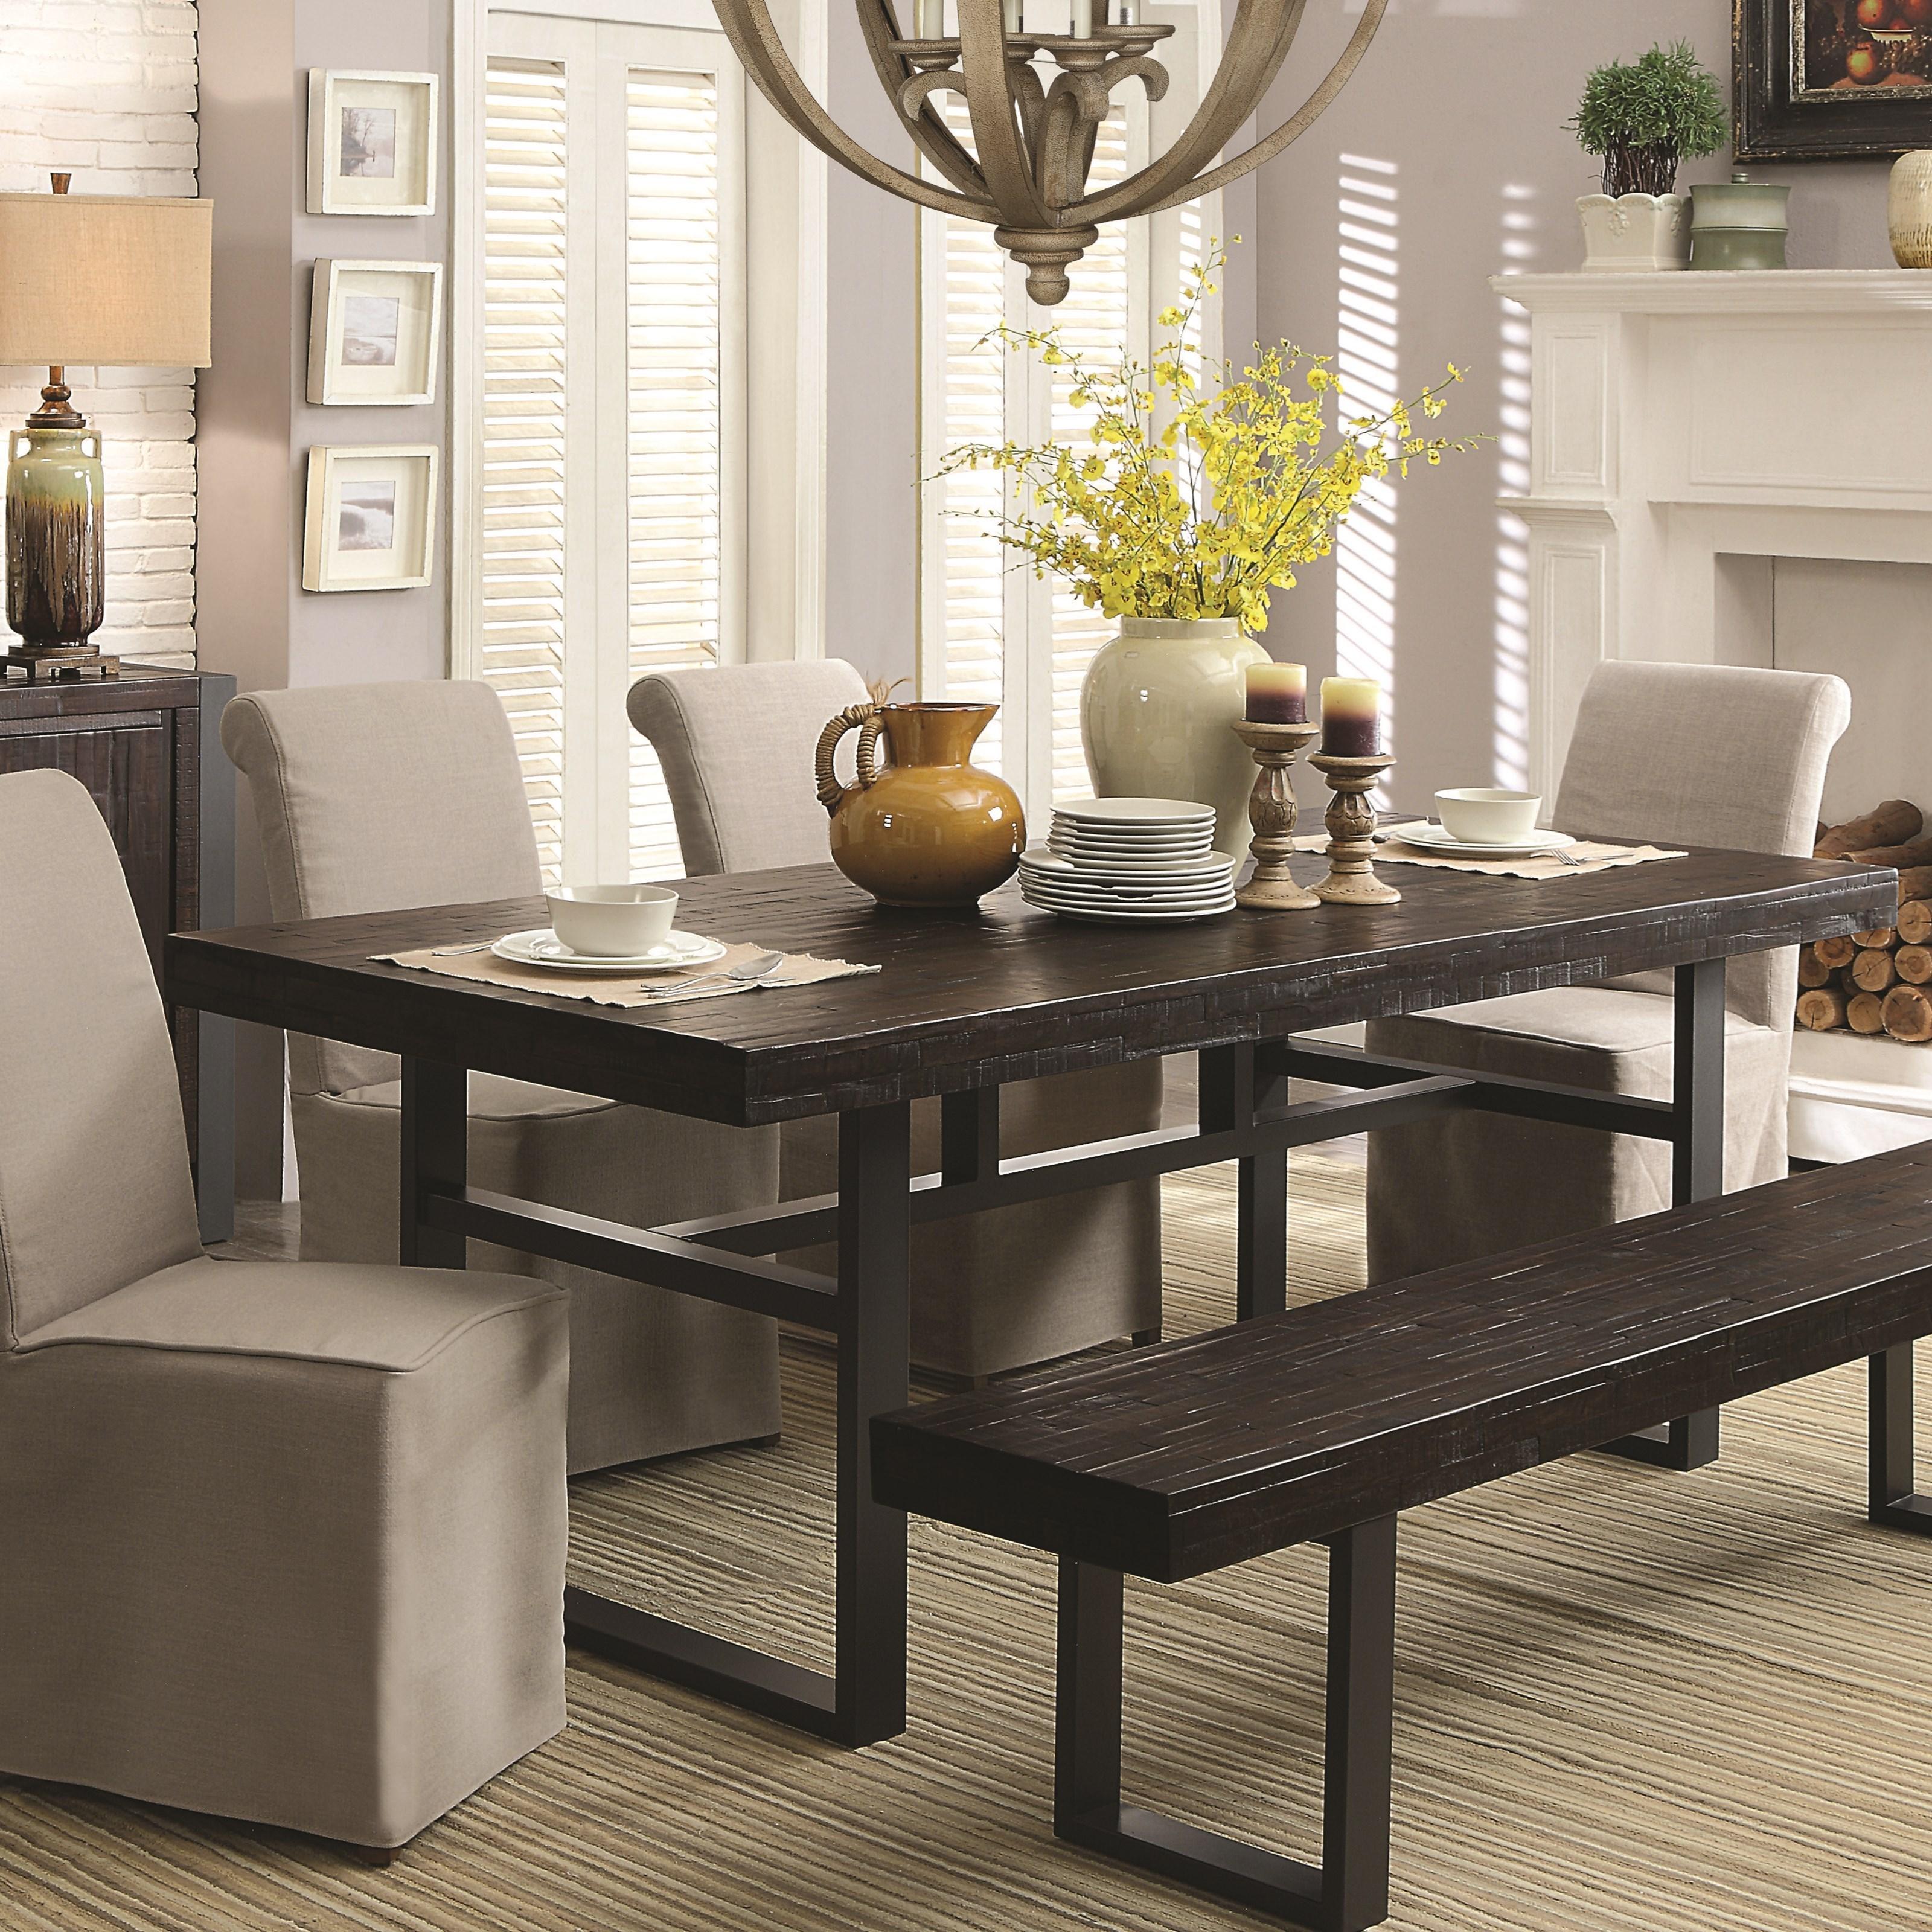 Coaster Keller Dining Table - Item Number: 106941